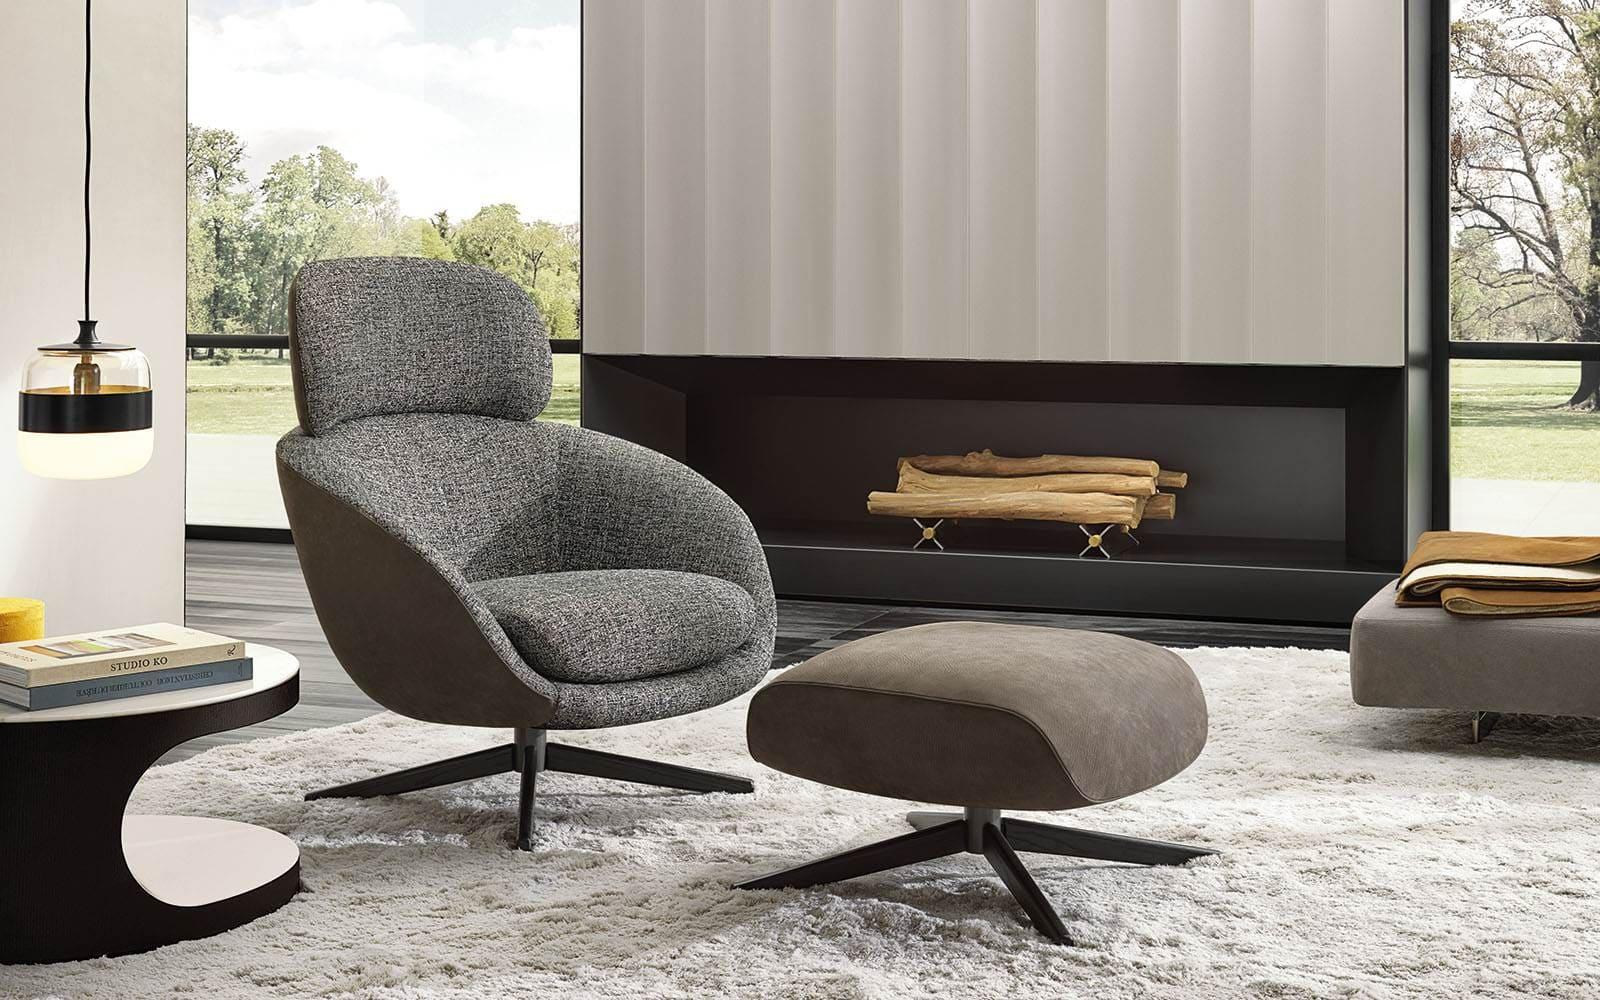 Sfera design Minotti soft furniture Russell